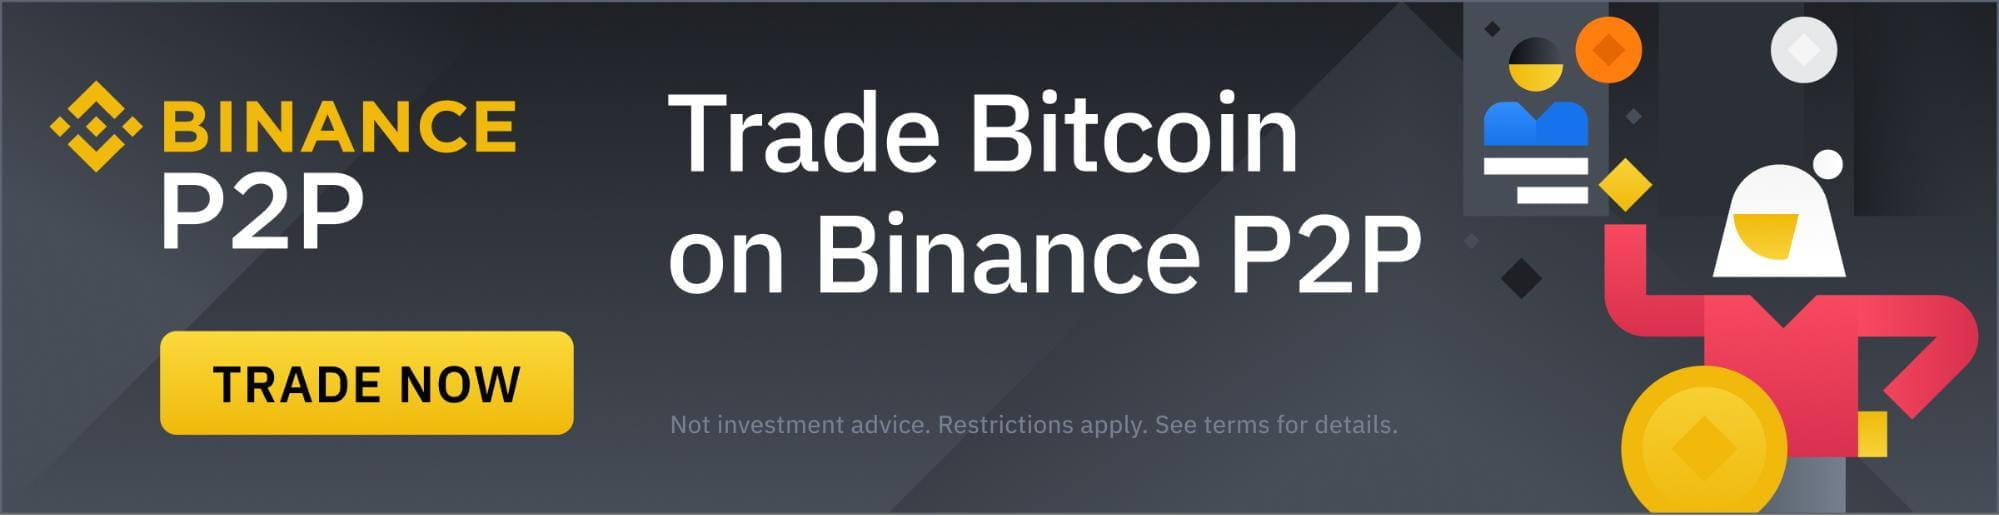 cryptocurrency trading jelentés